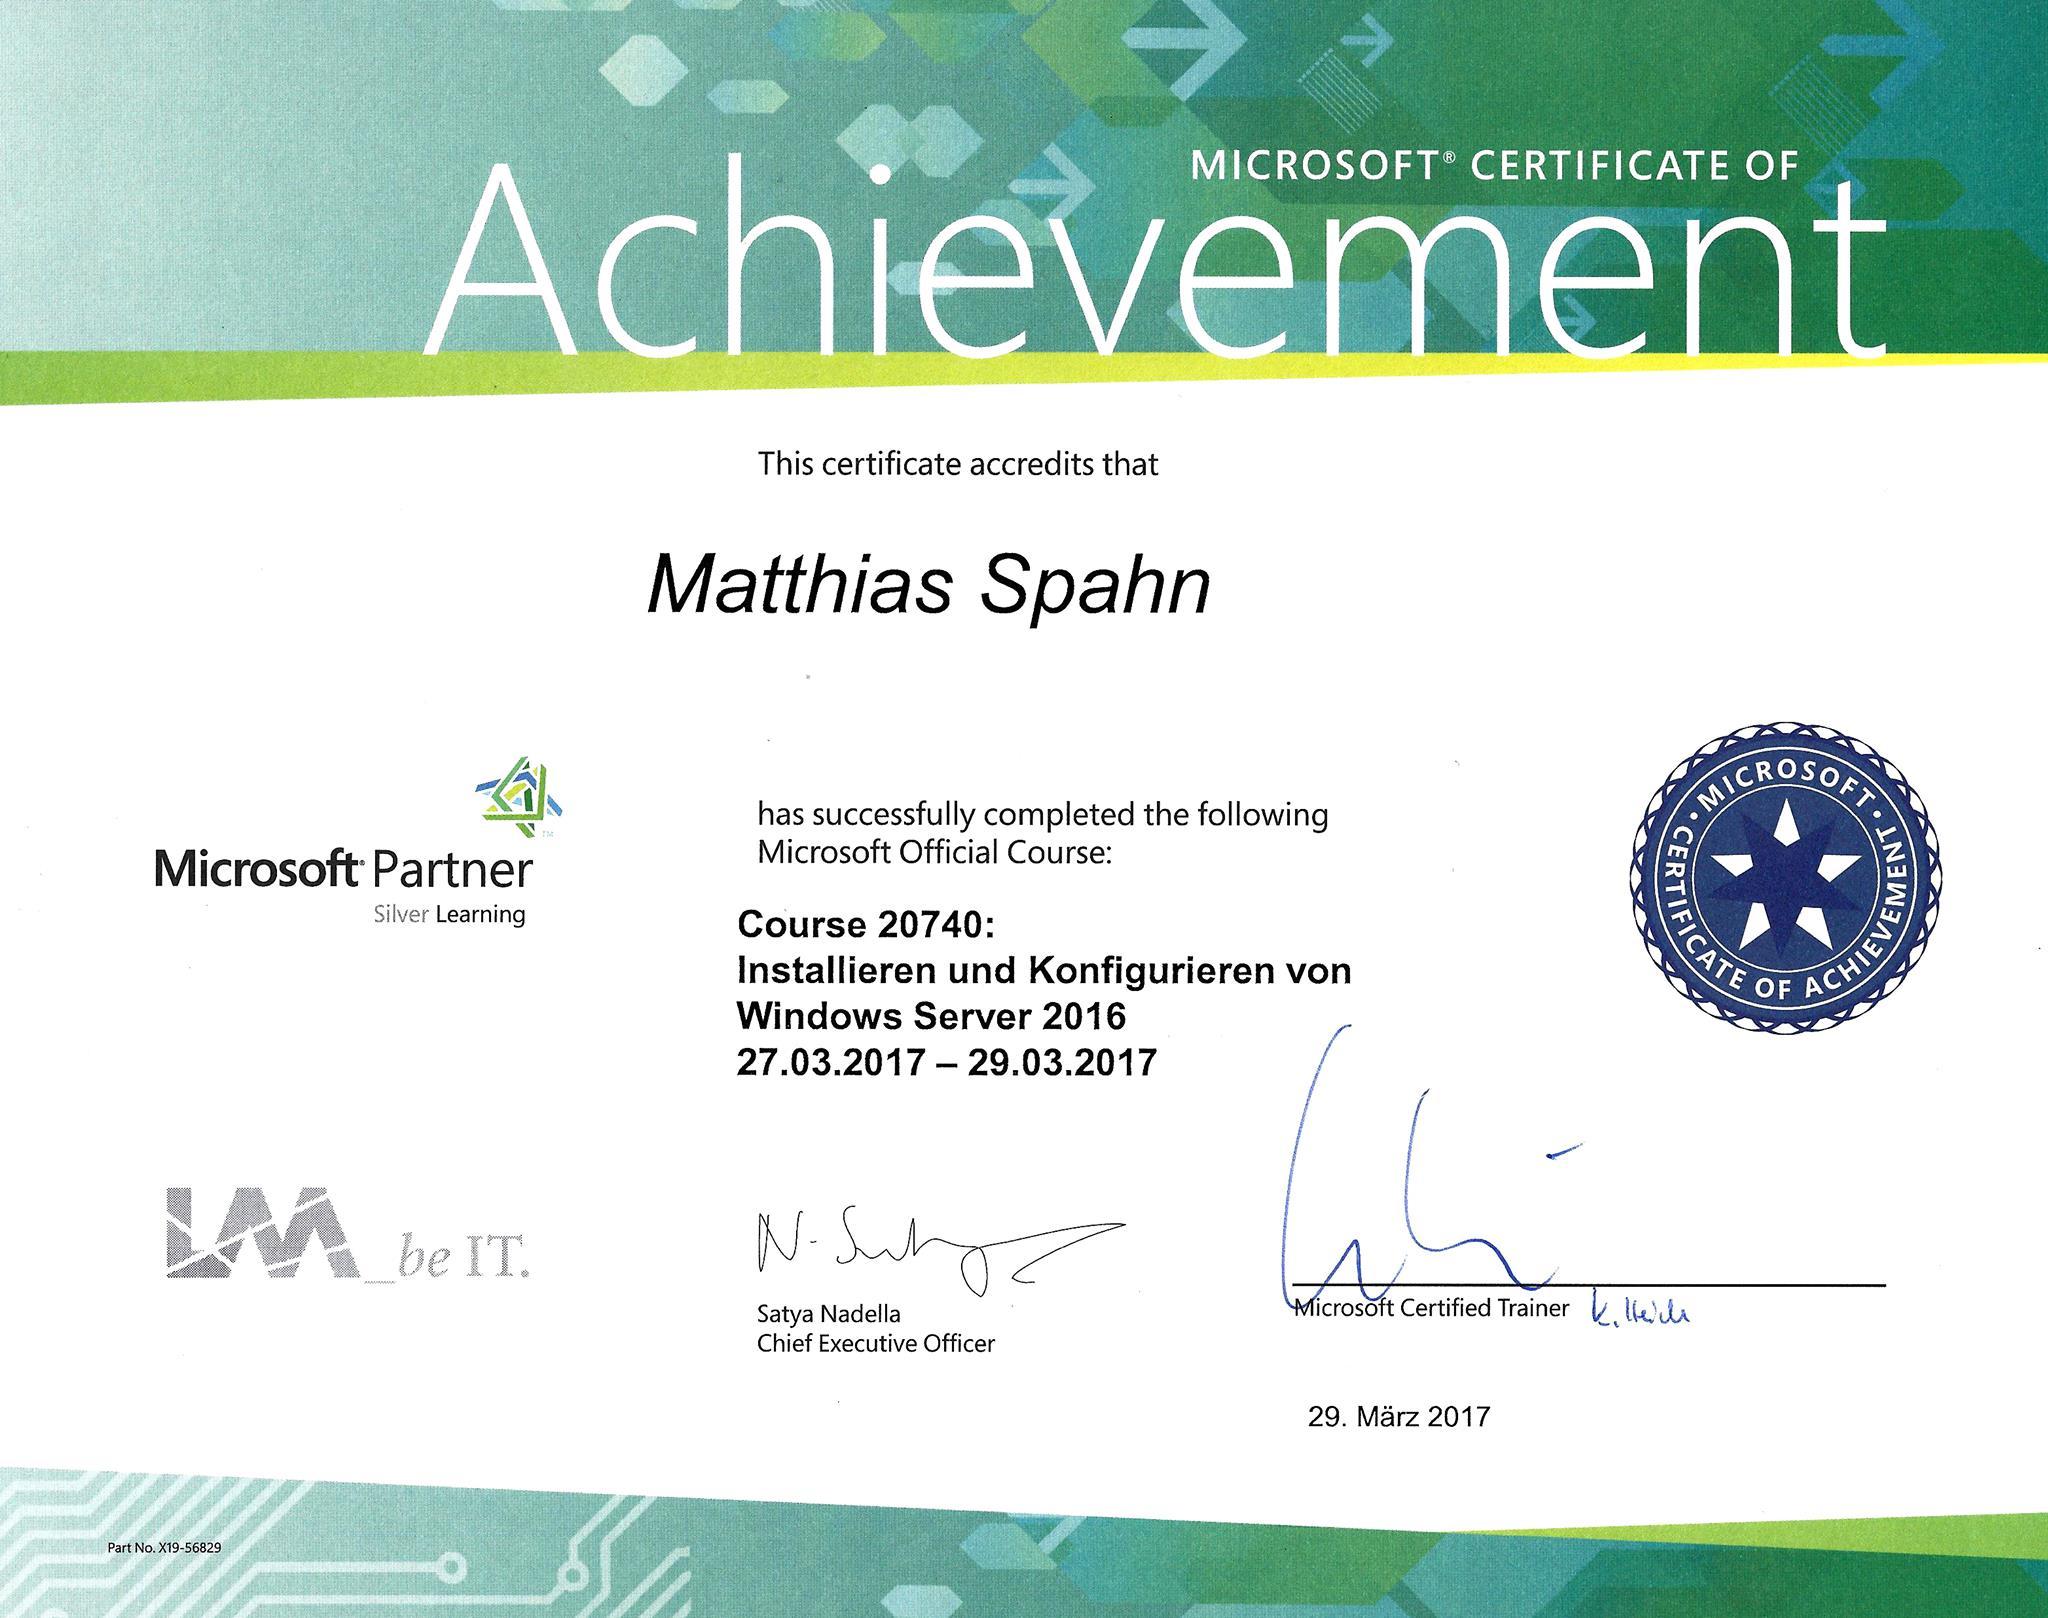 Microsoft Partner Matthias Spahn